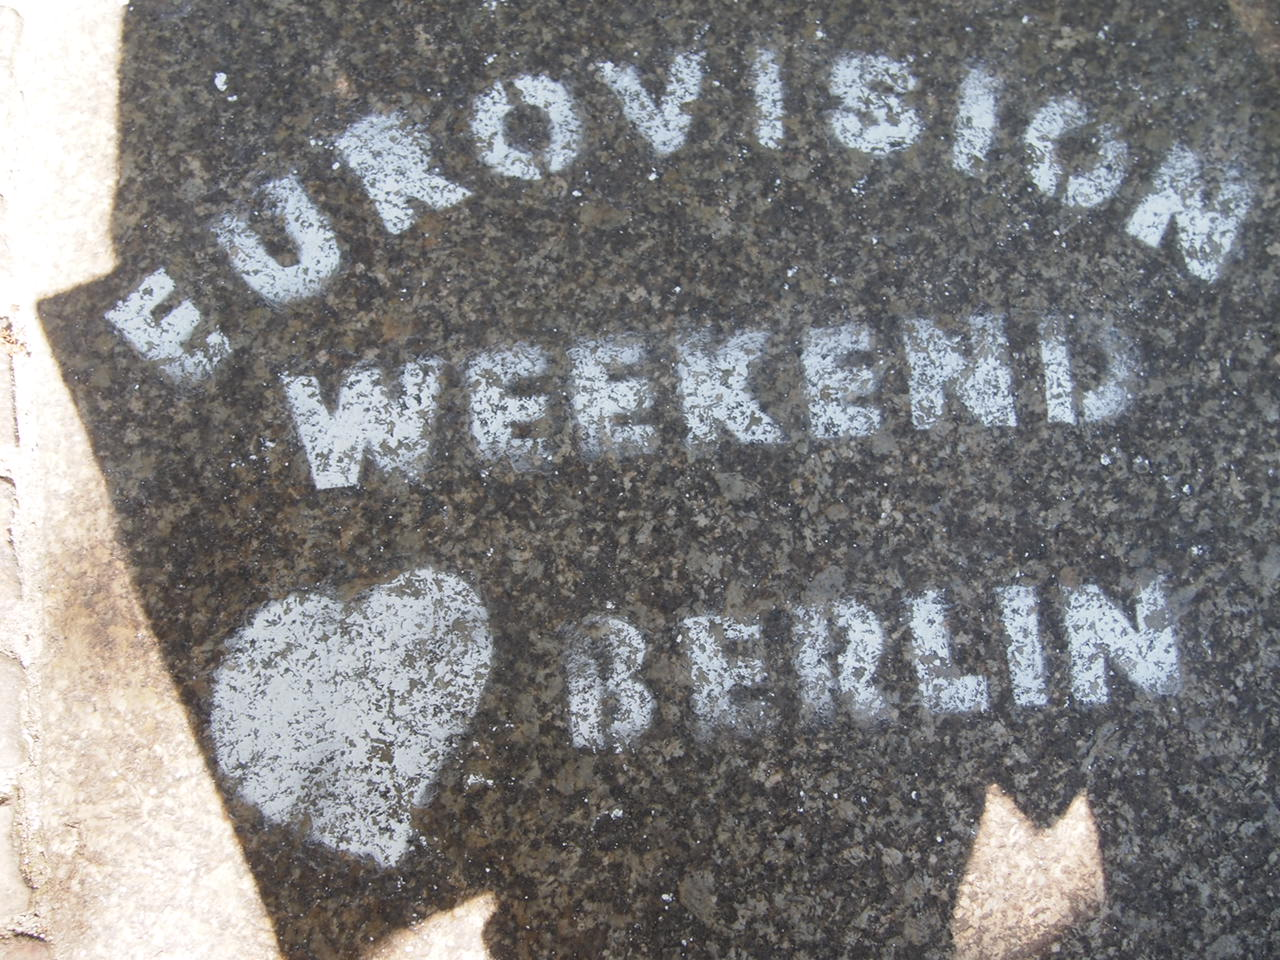 P7198648 アートと自然の多いベルリンの街並み